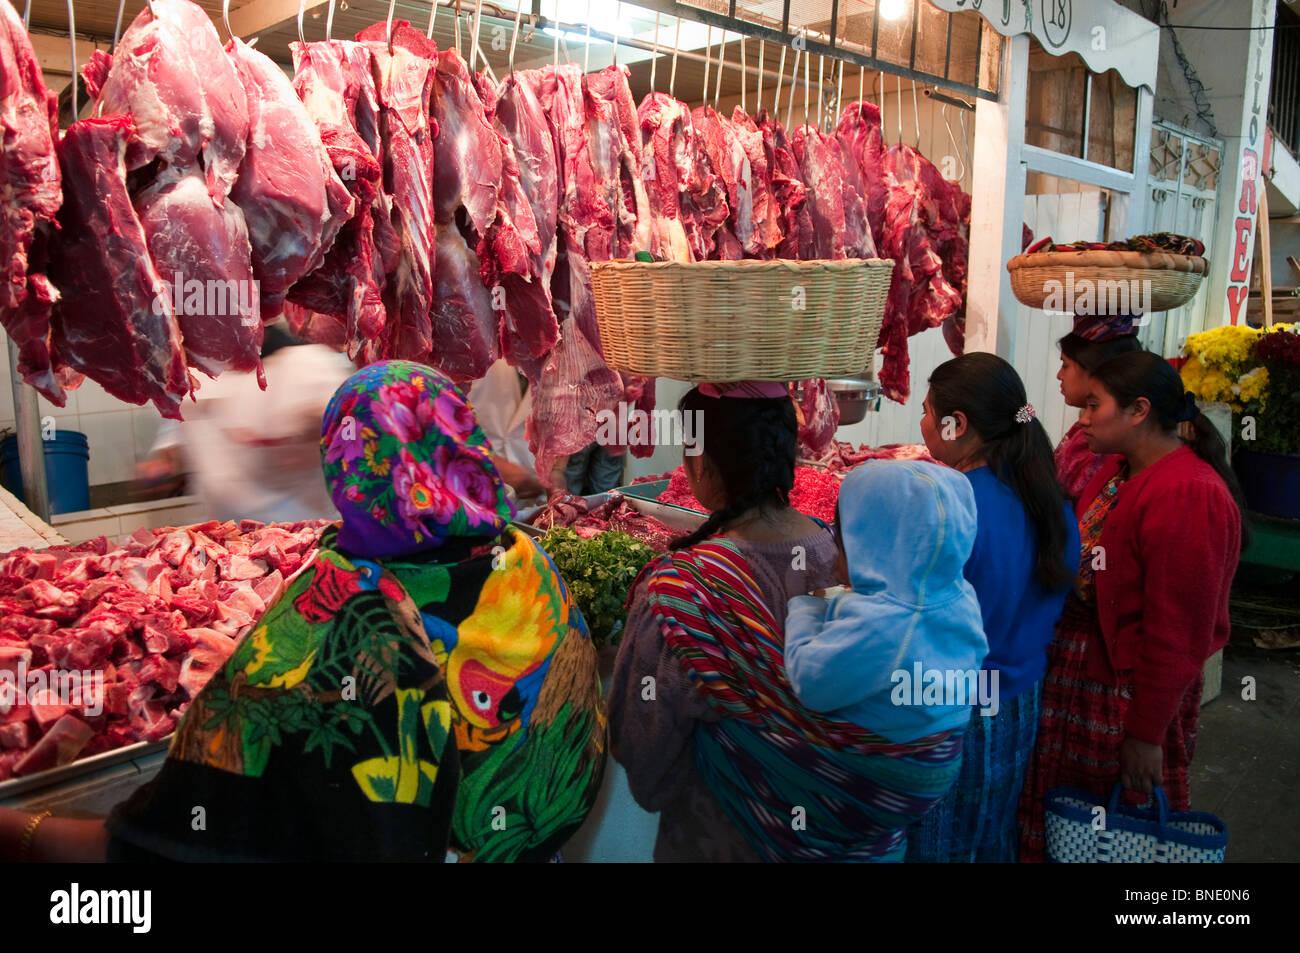 Customers at a butcher's shop, Totonicapan, Guatemala Stock Photo